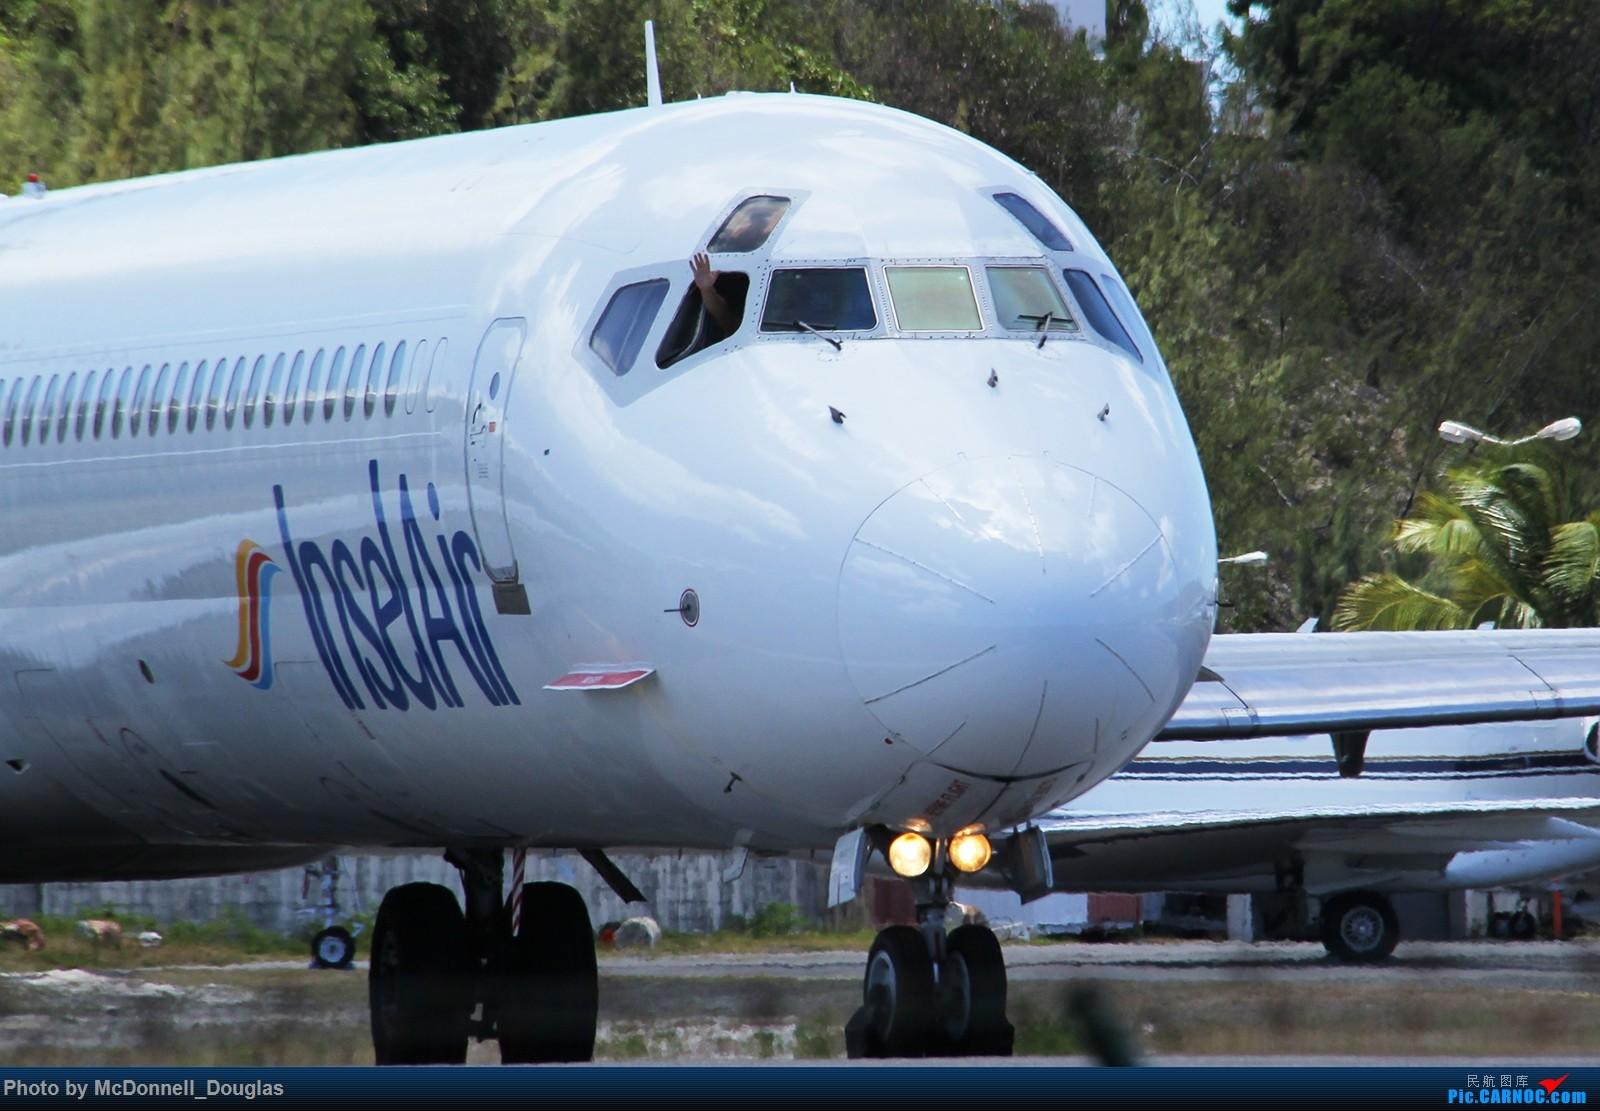 Re:【上海飞友会】出国转转拍拍机系列----第二弹:圣马丁篇 MCDONNELL DOUGLAS MD-82 PJ-MDE 荷属安的列斯群岛朱利安娜公主机场